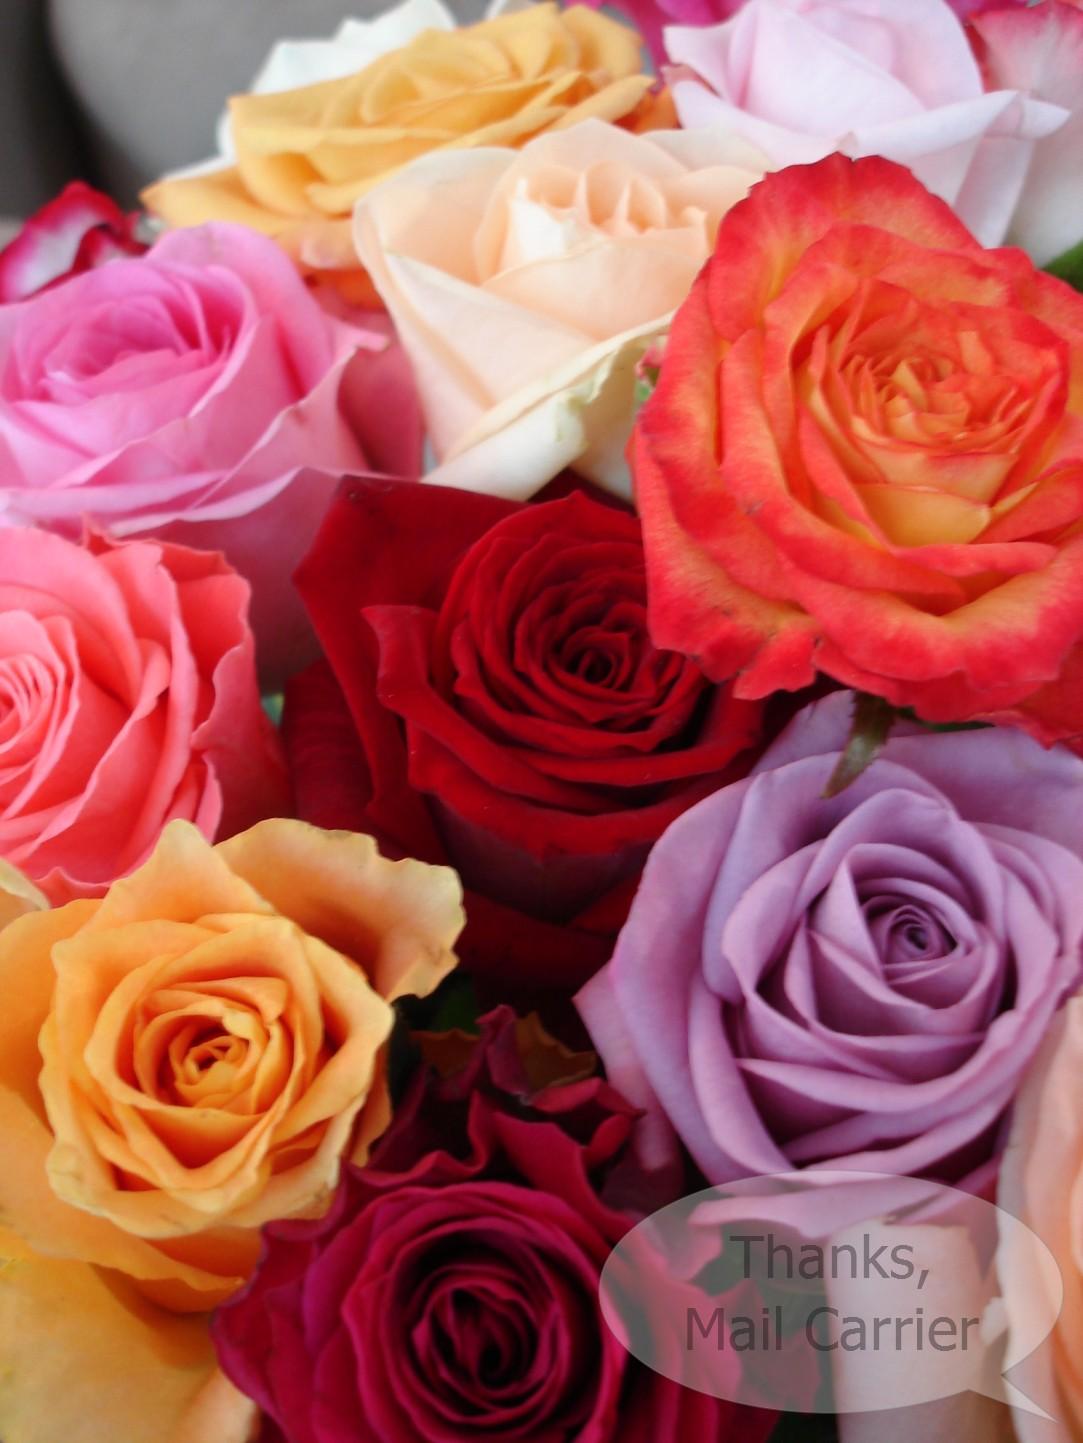 color roses wallpaper hd wallpapersafari. Black Bedroom Furniture Sets. Home Design Ideas